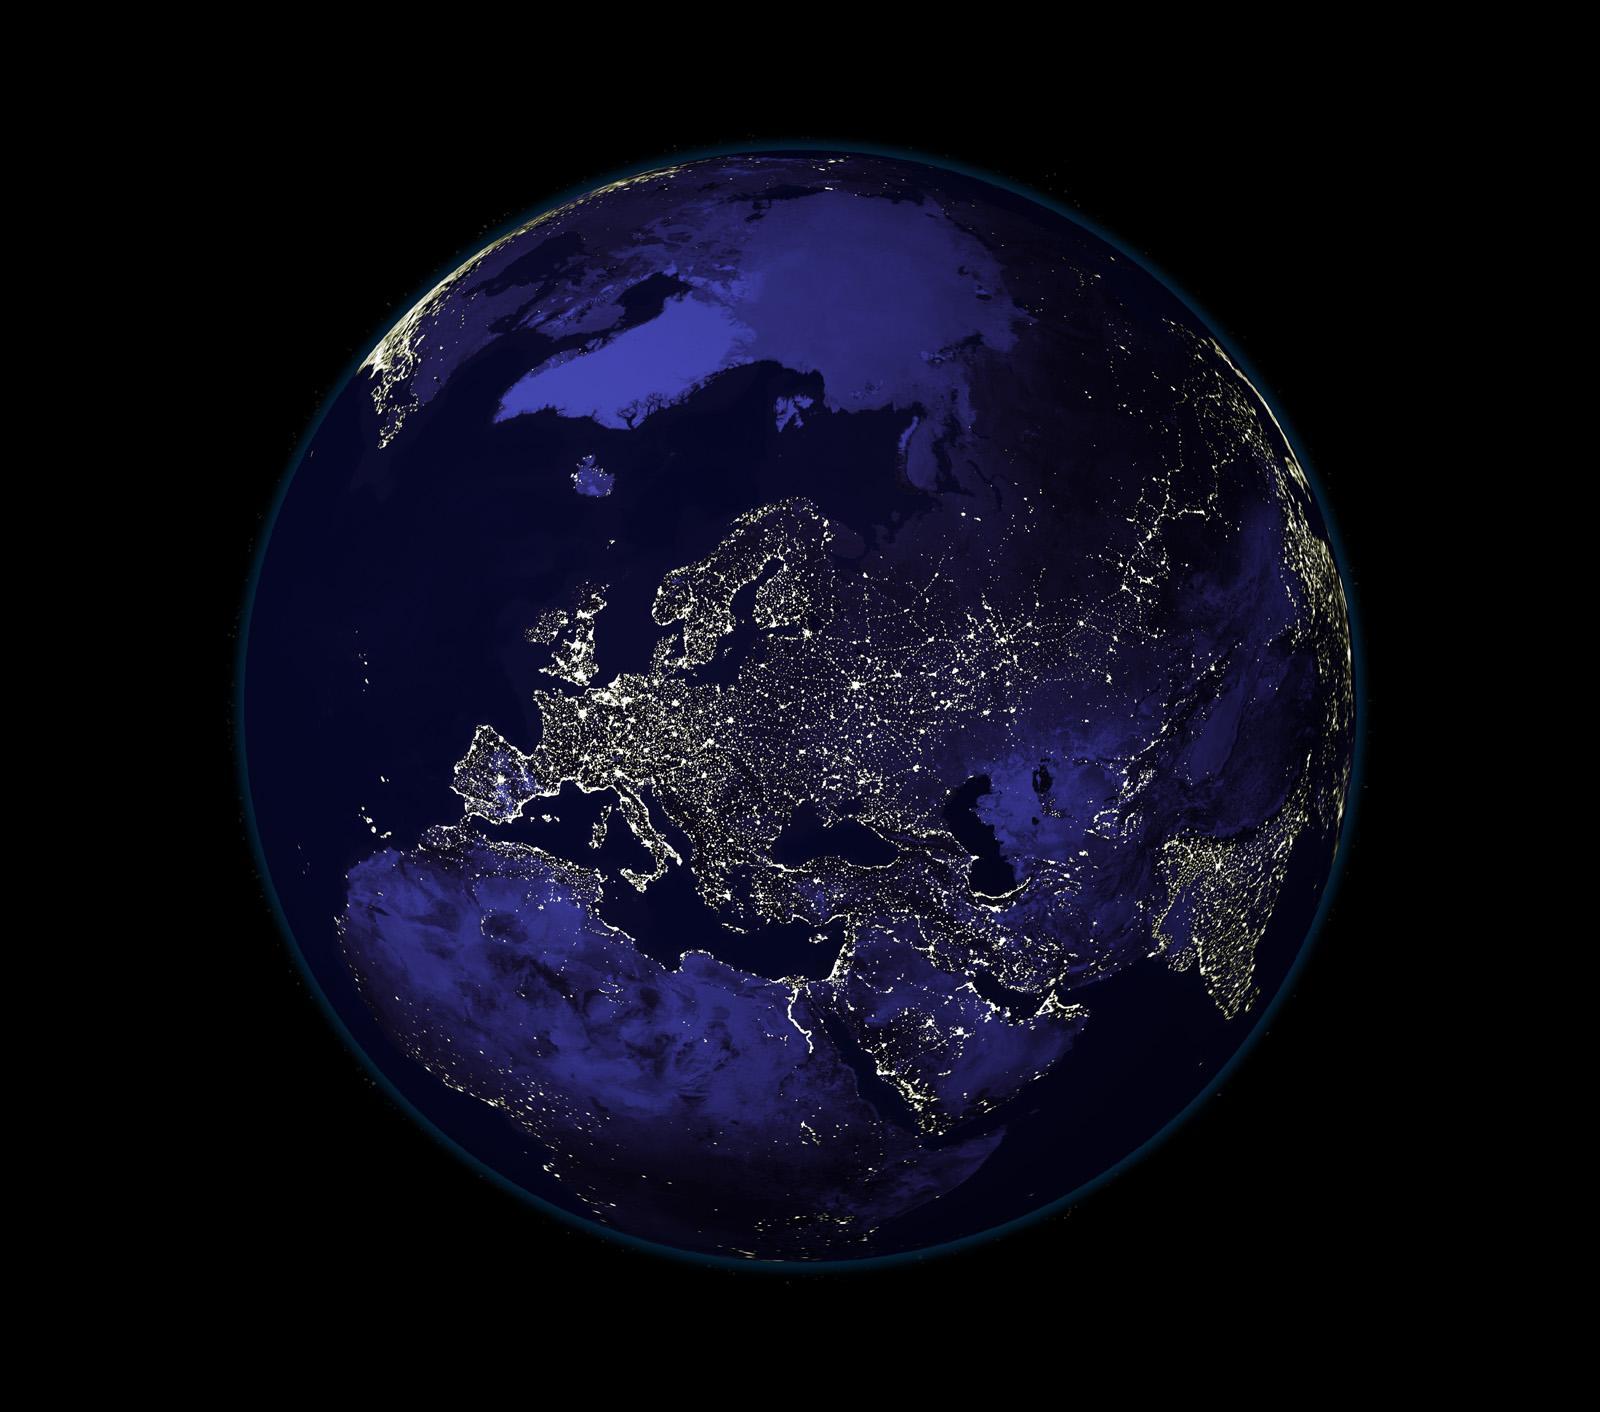 EARTH AT NIGHT WALLPAPER   34624   HD Wallpapers   [desktopinHQnet 1600x1412